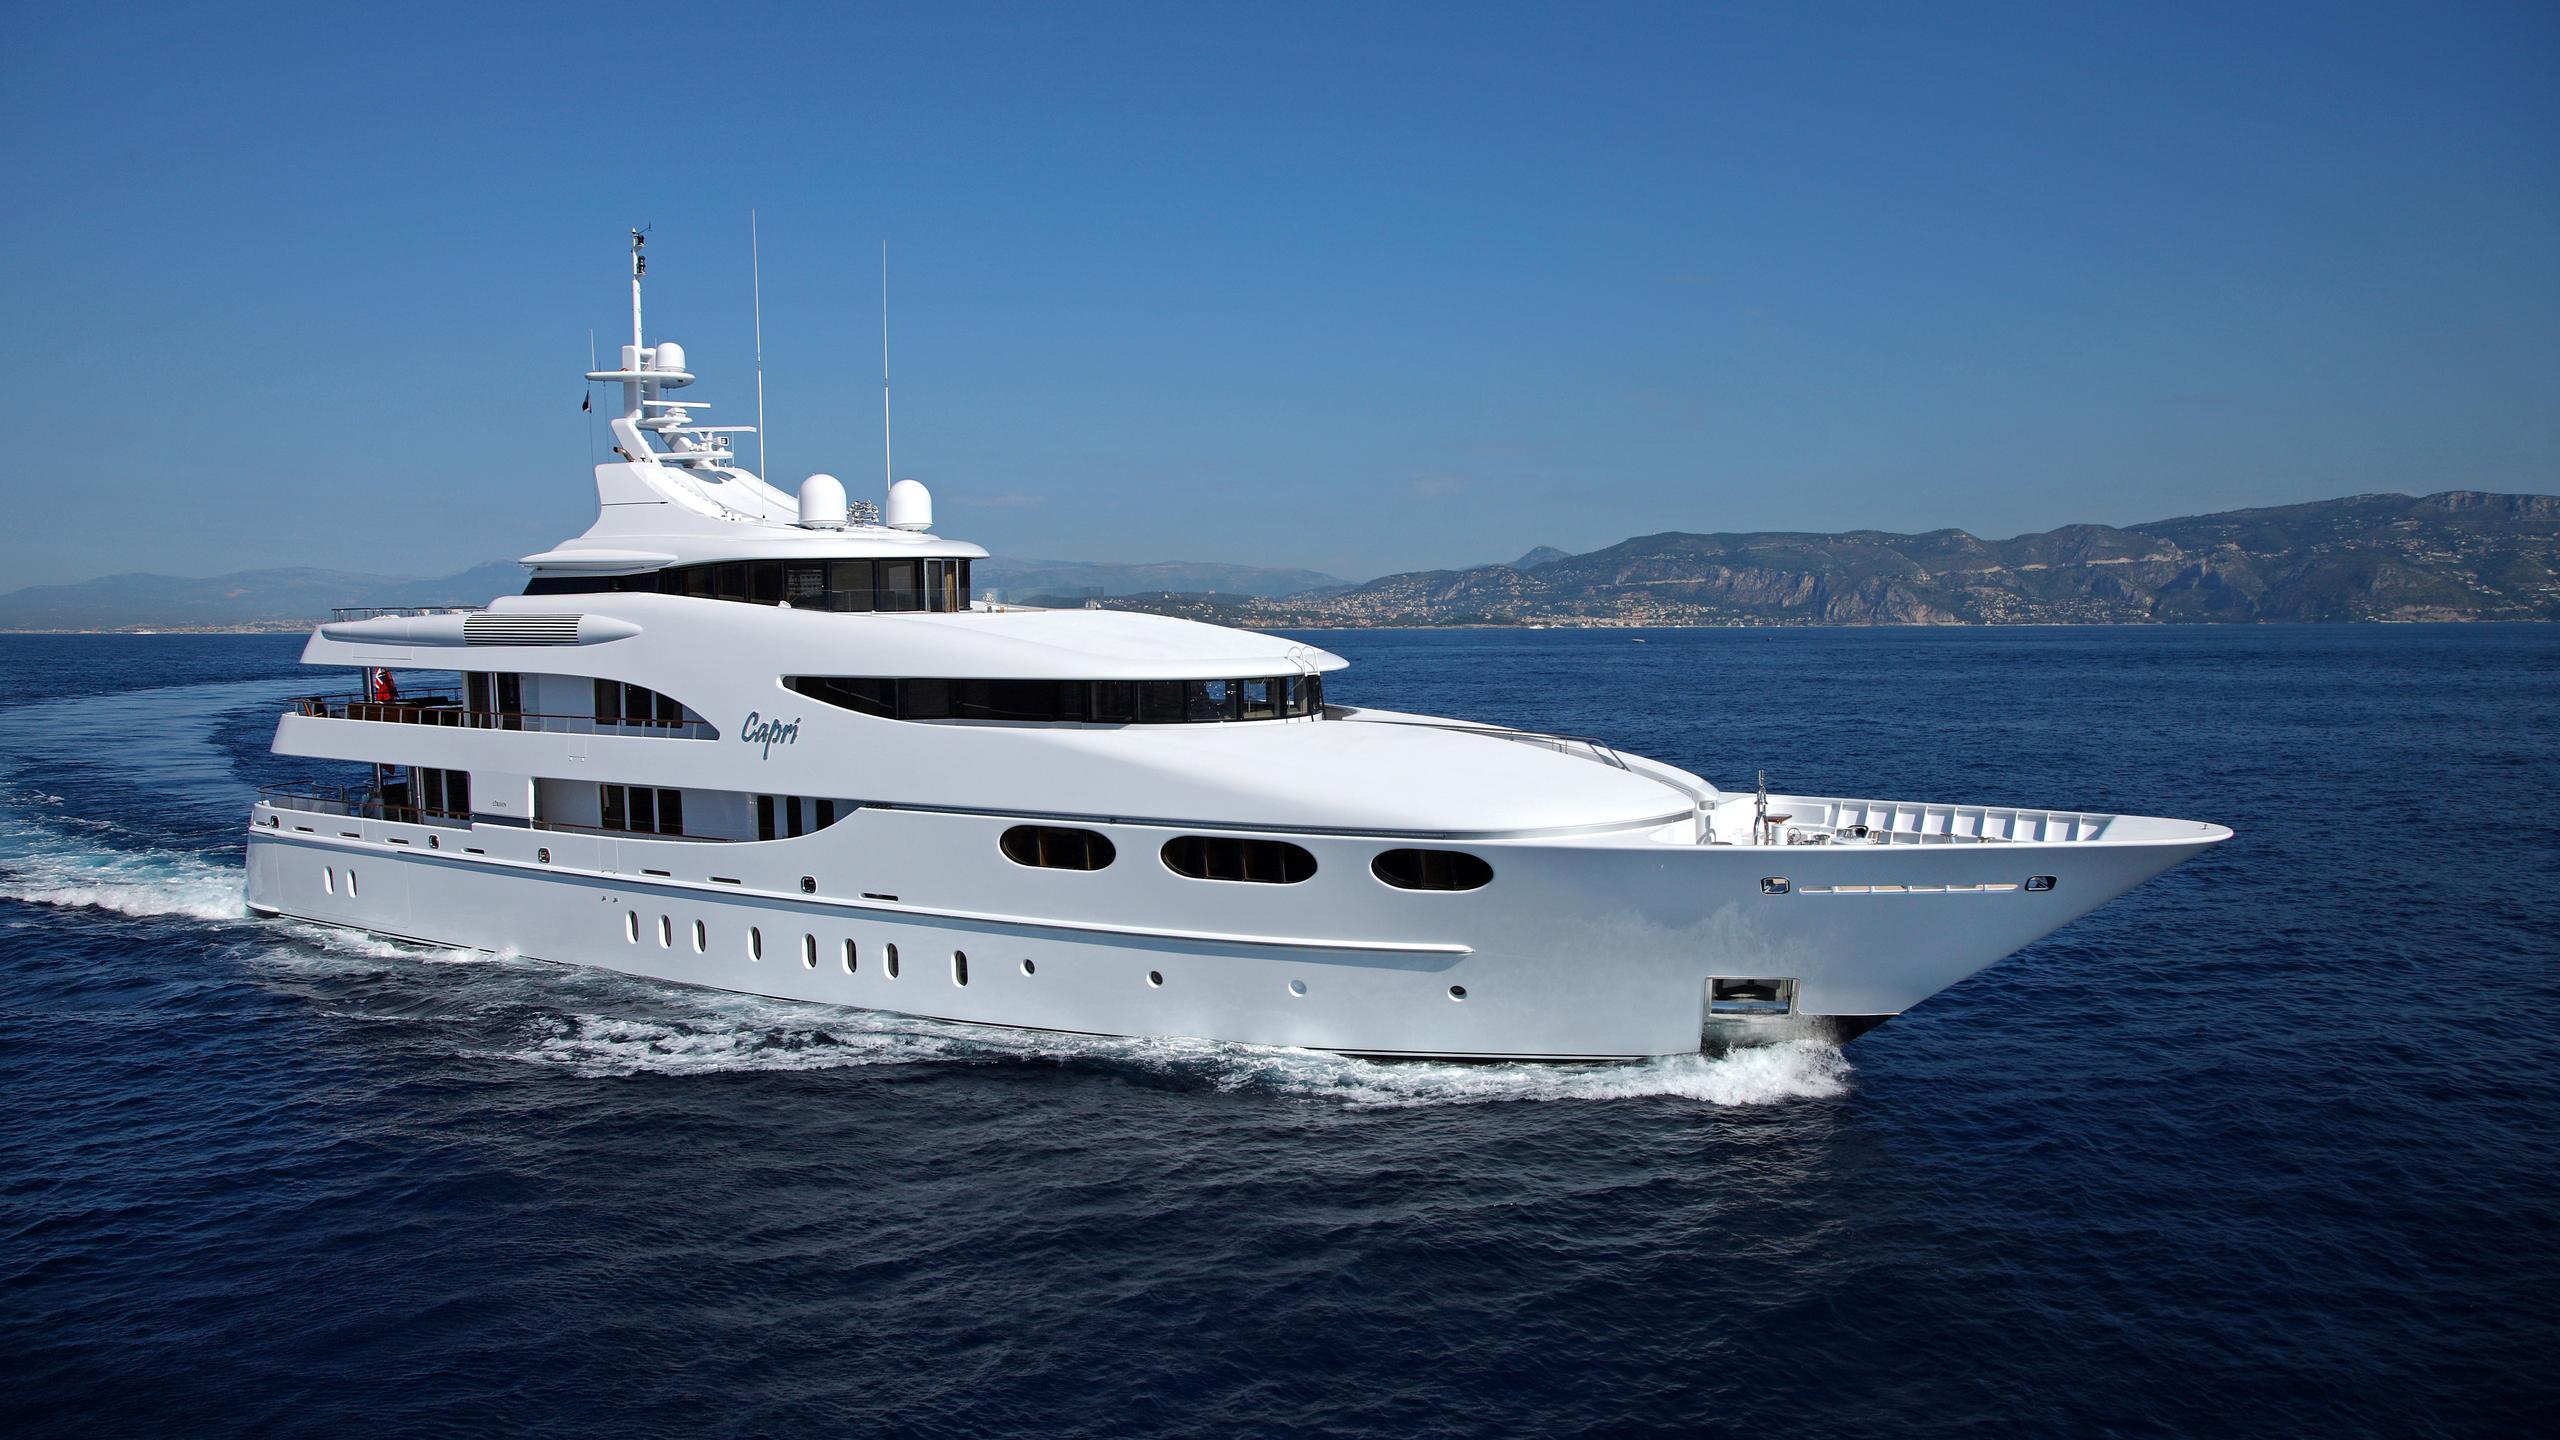 capri-yacht-for-sale-profile